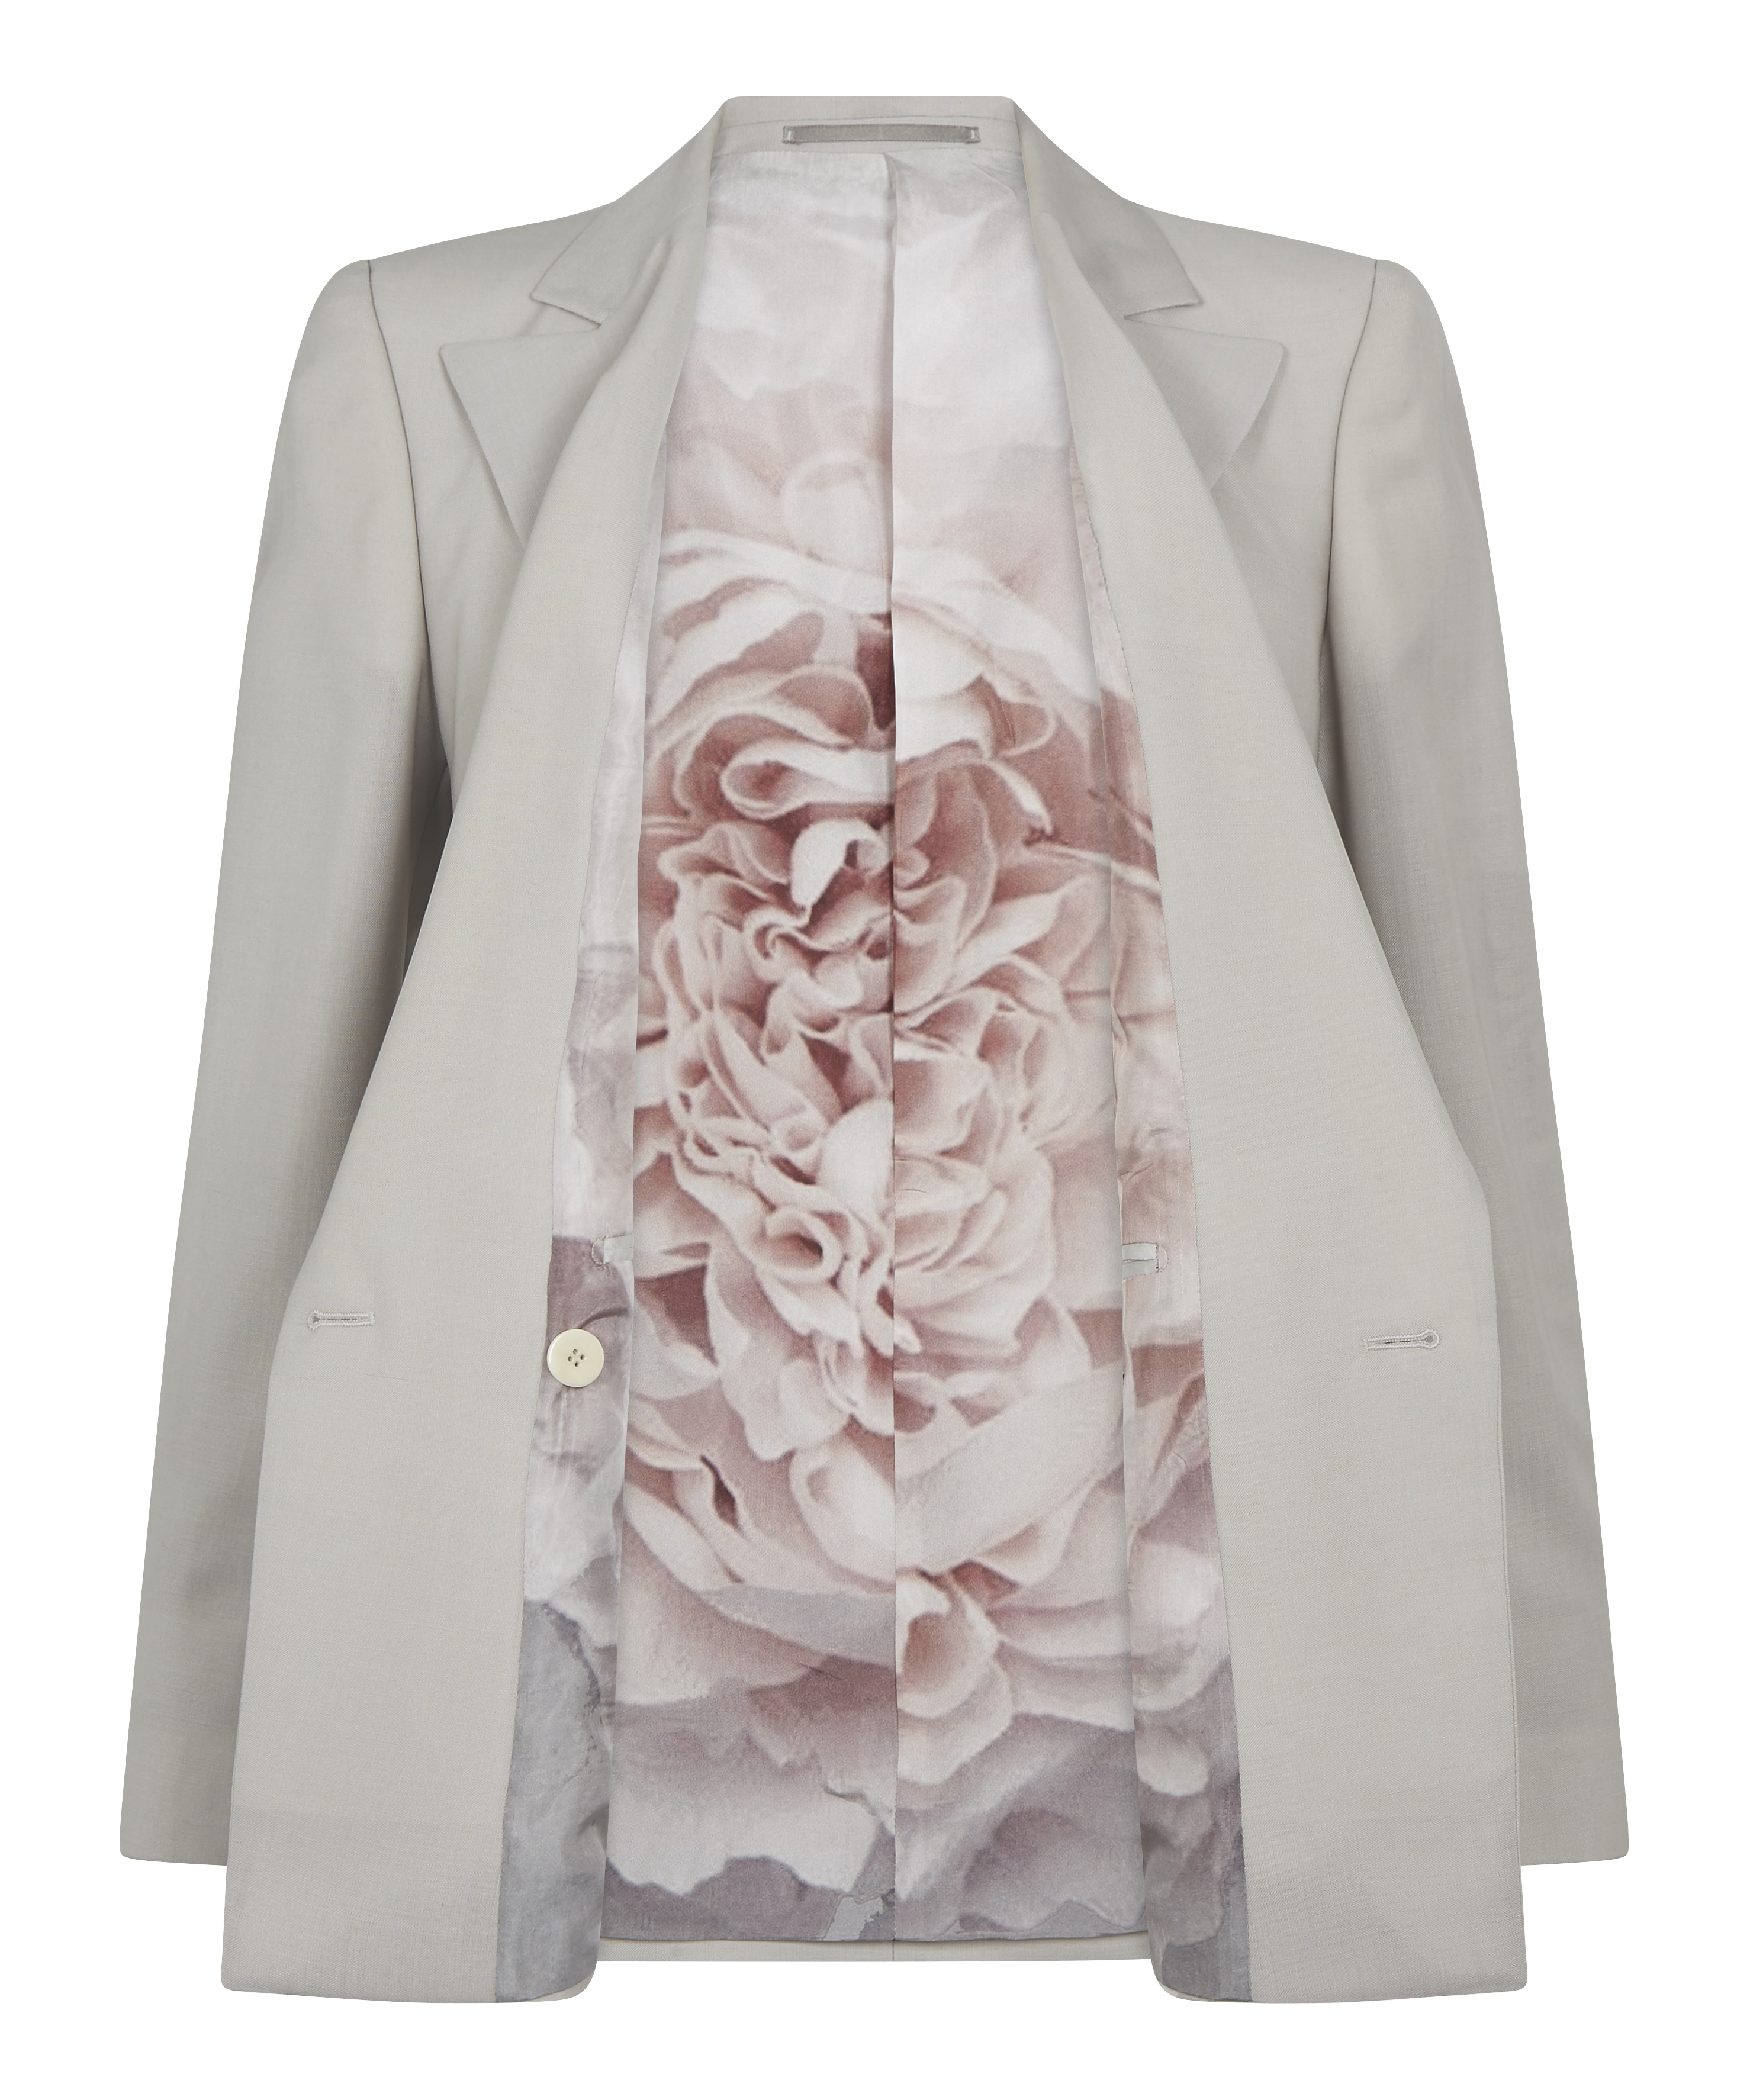 Gormley & Gamble Grey Suit Jacket